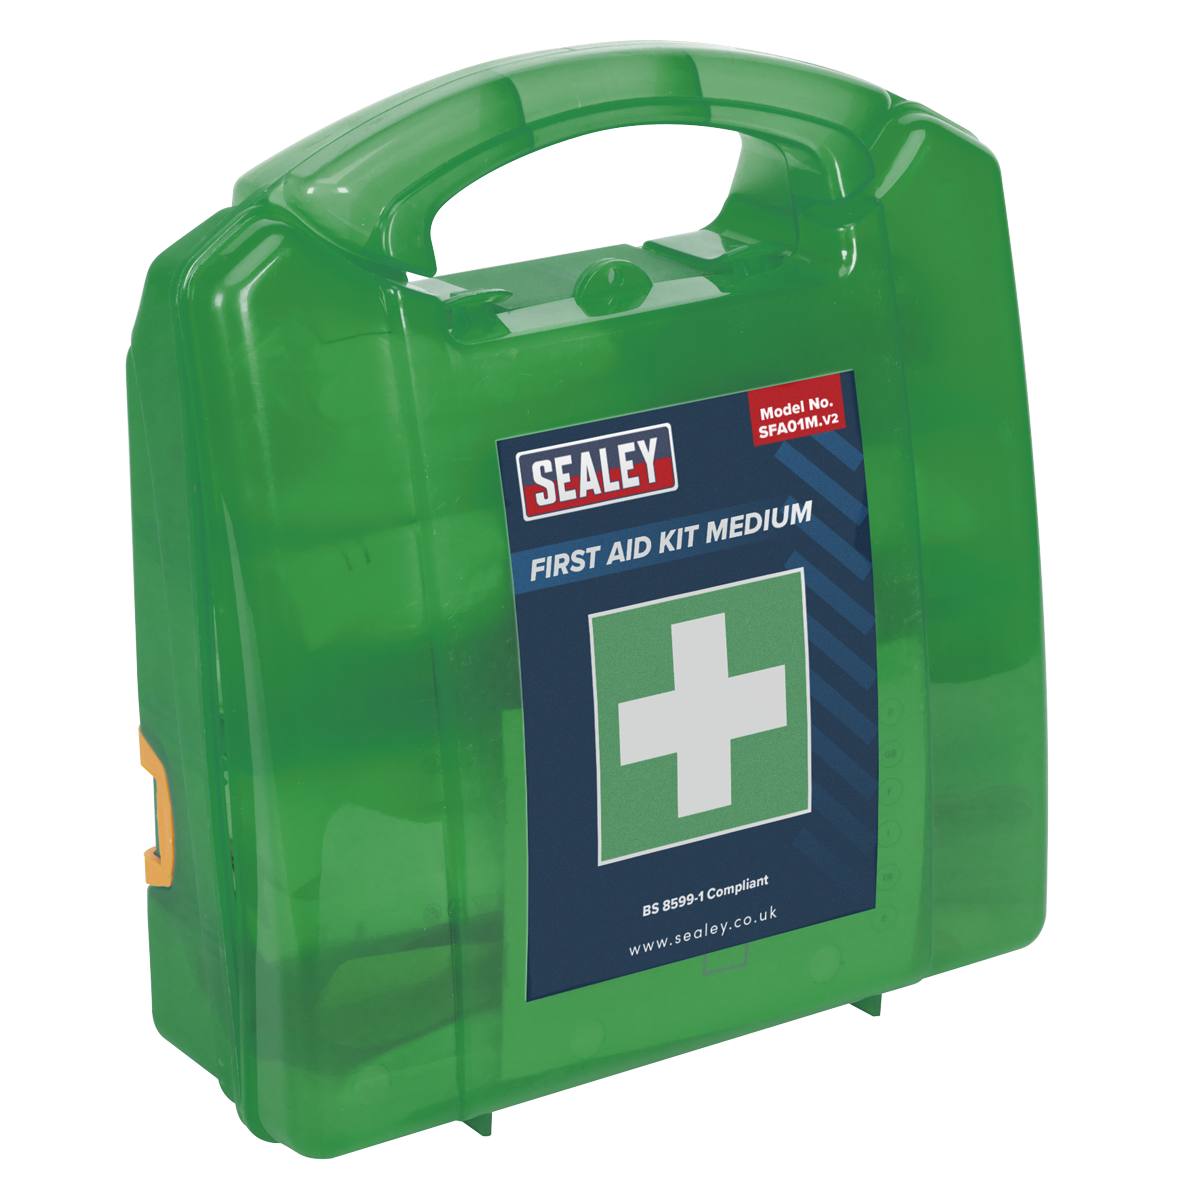 First Aid Kit Medium - BS 8599-1 Compliant